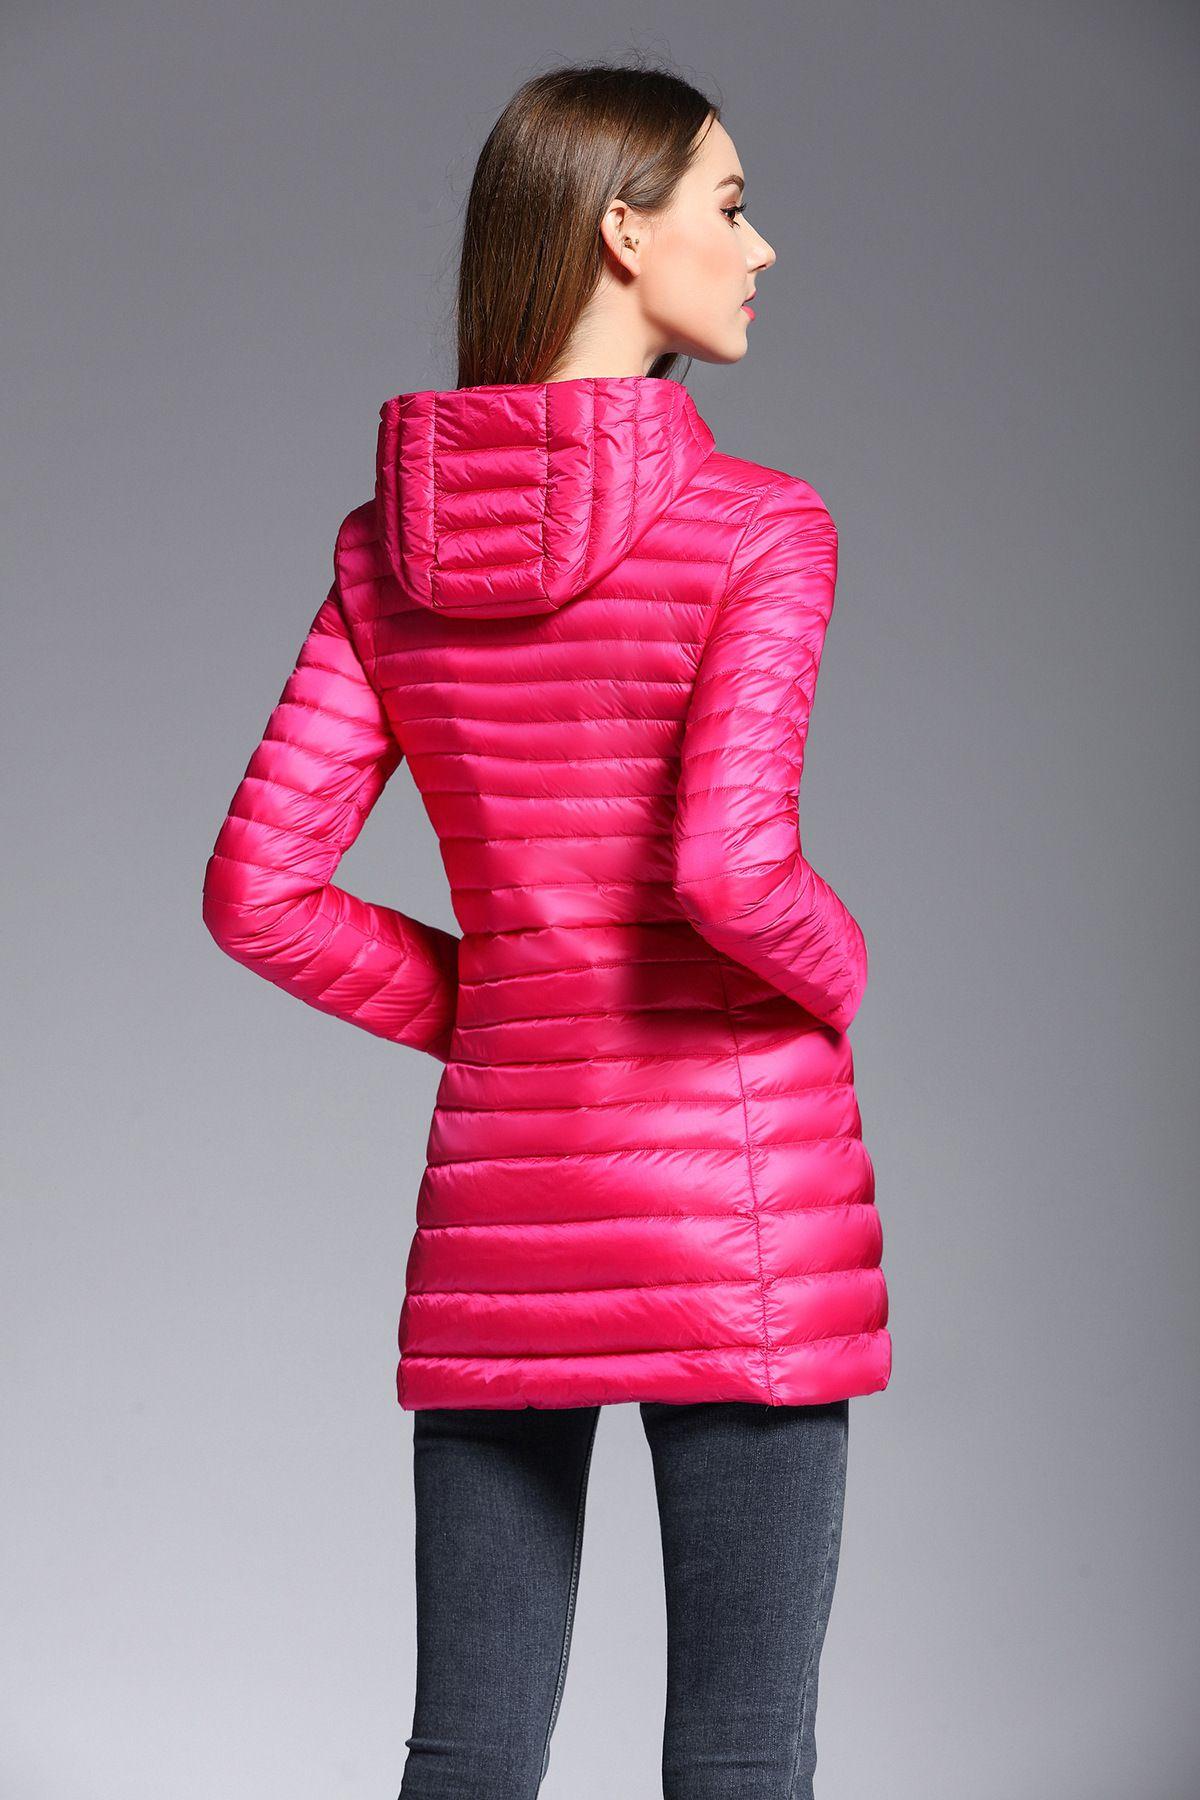 818d6b7b0 Hooded Winter Spring Women 90% White Duck Dow Down Jacket Woman ...